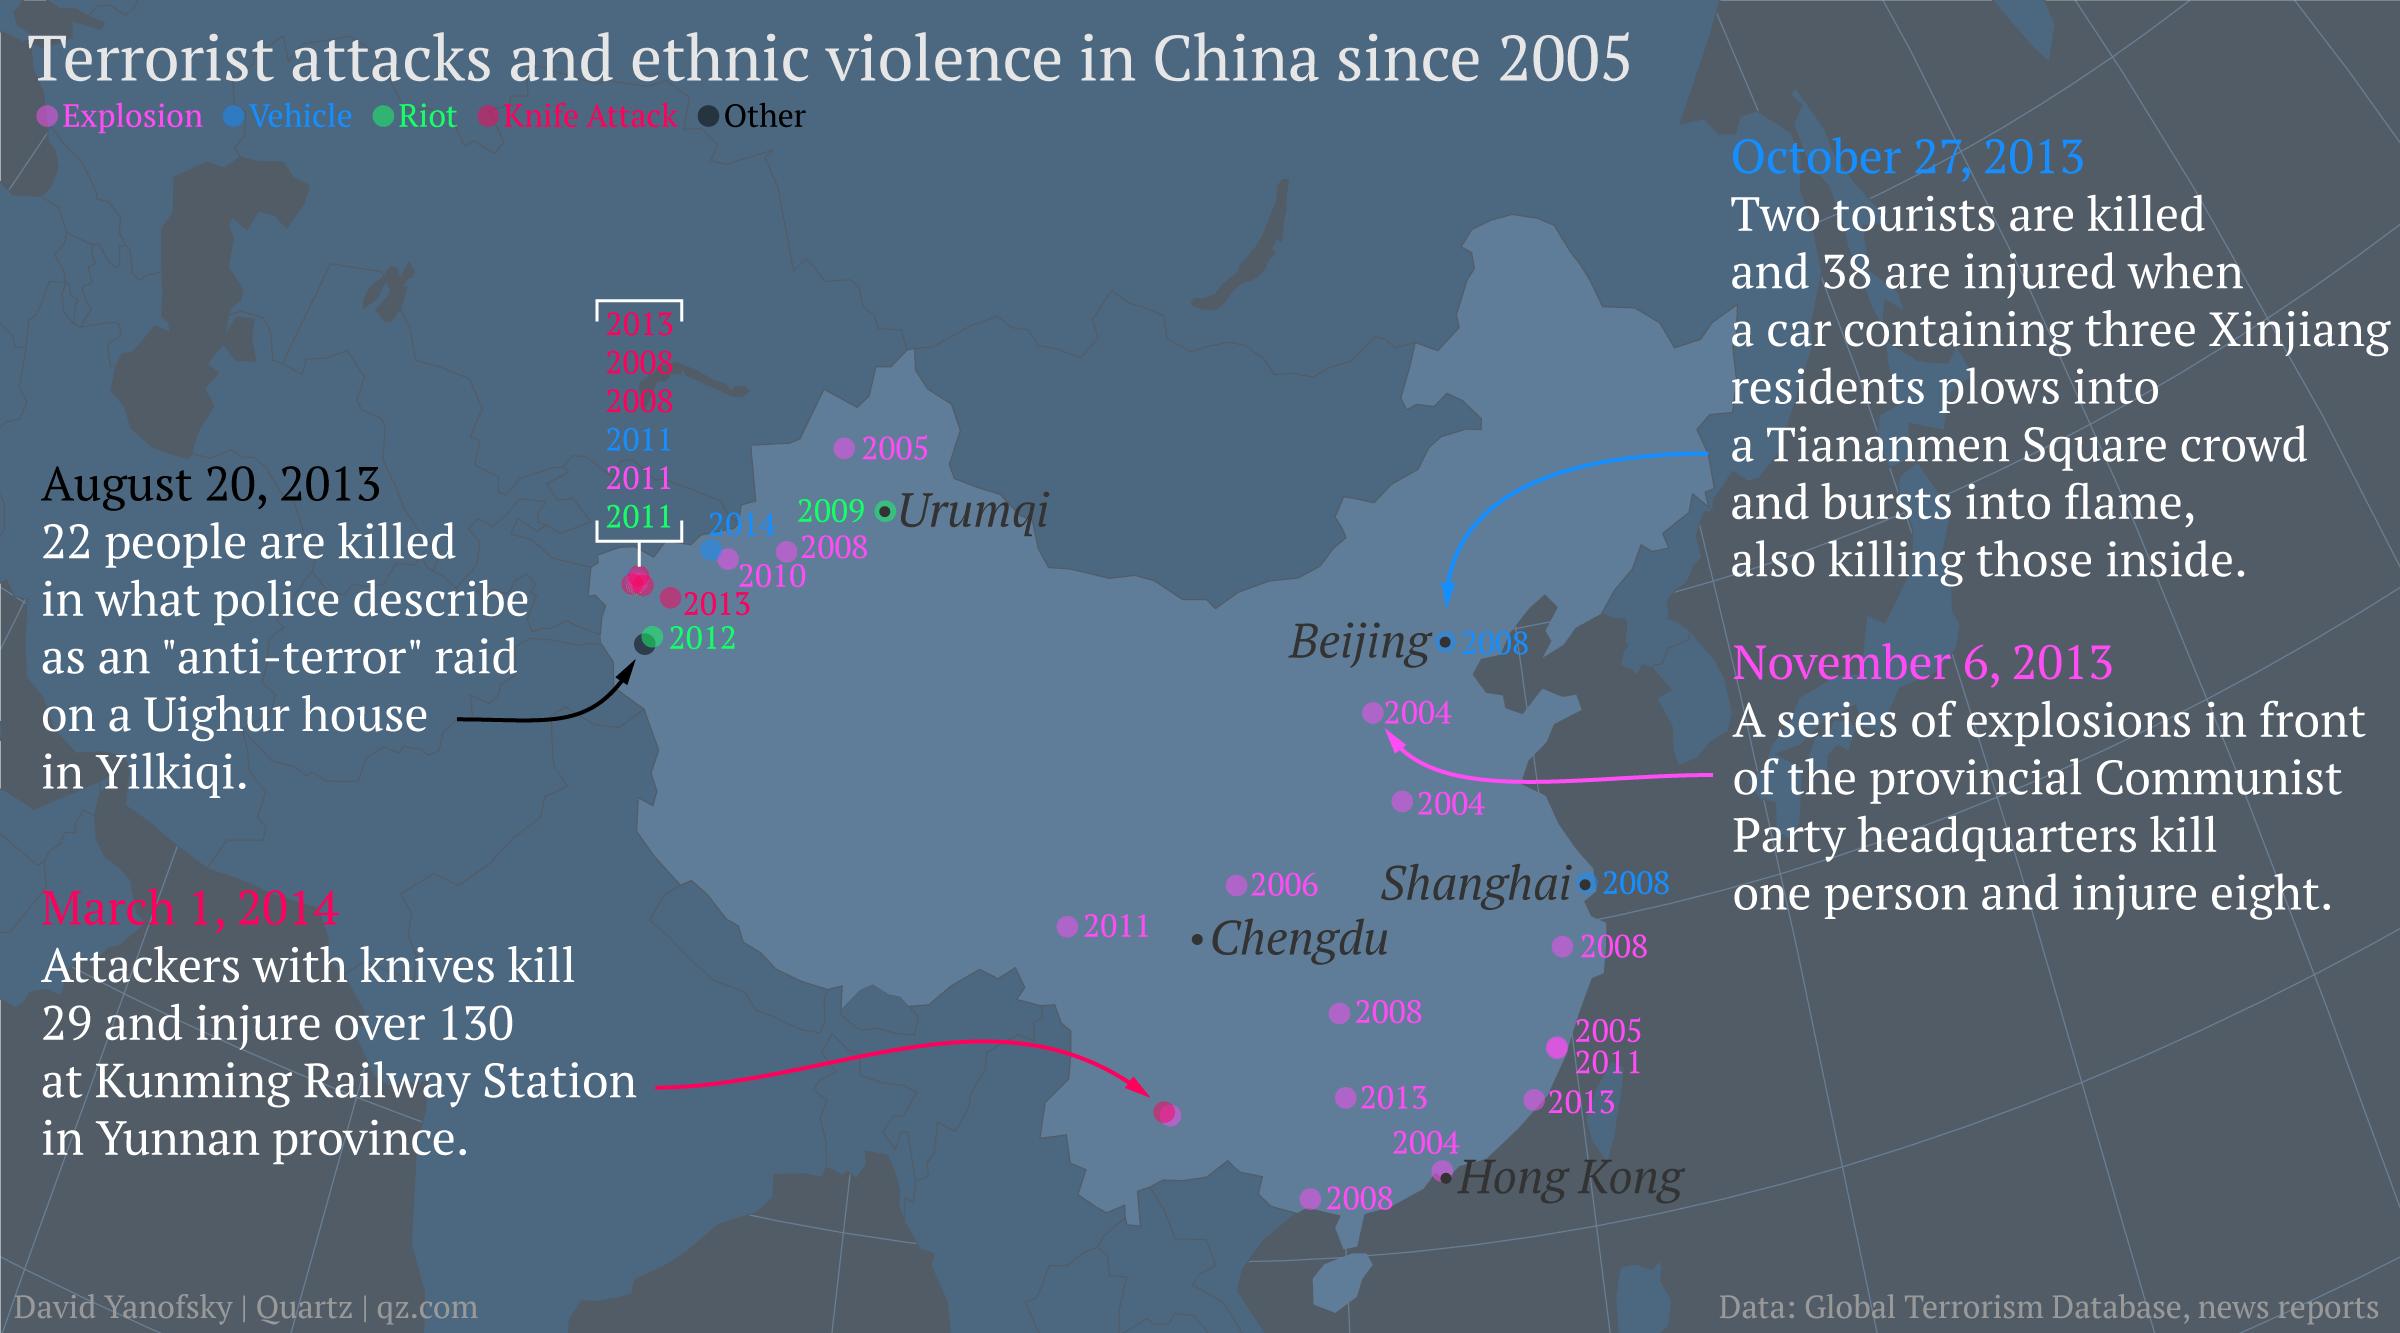 yanofsky_terrorist_attacks_and_ethnic_violence_in_china_since_2005_2014